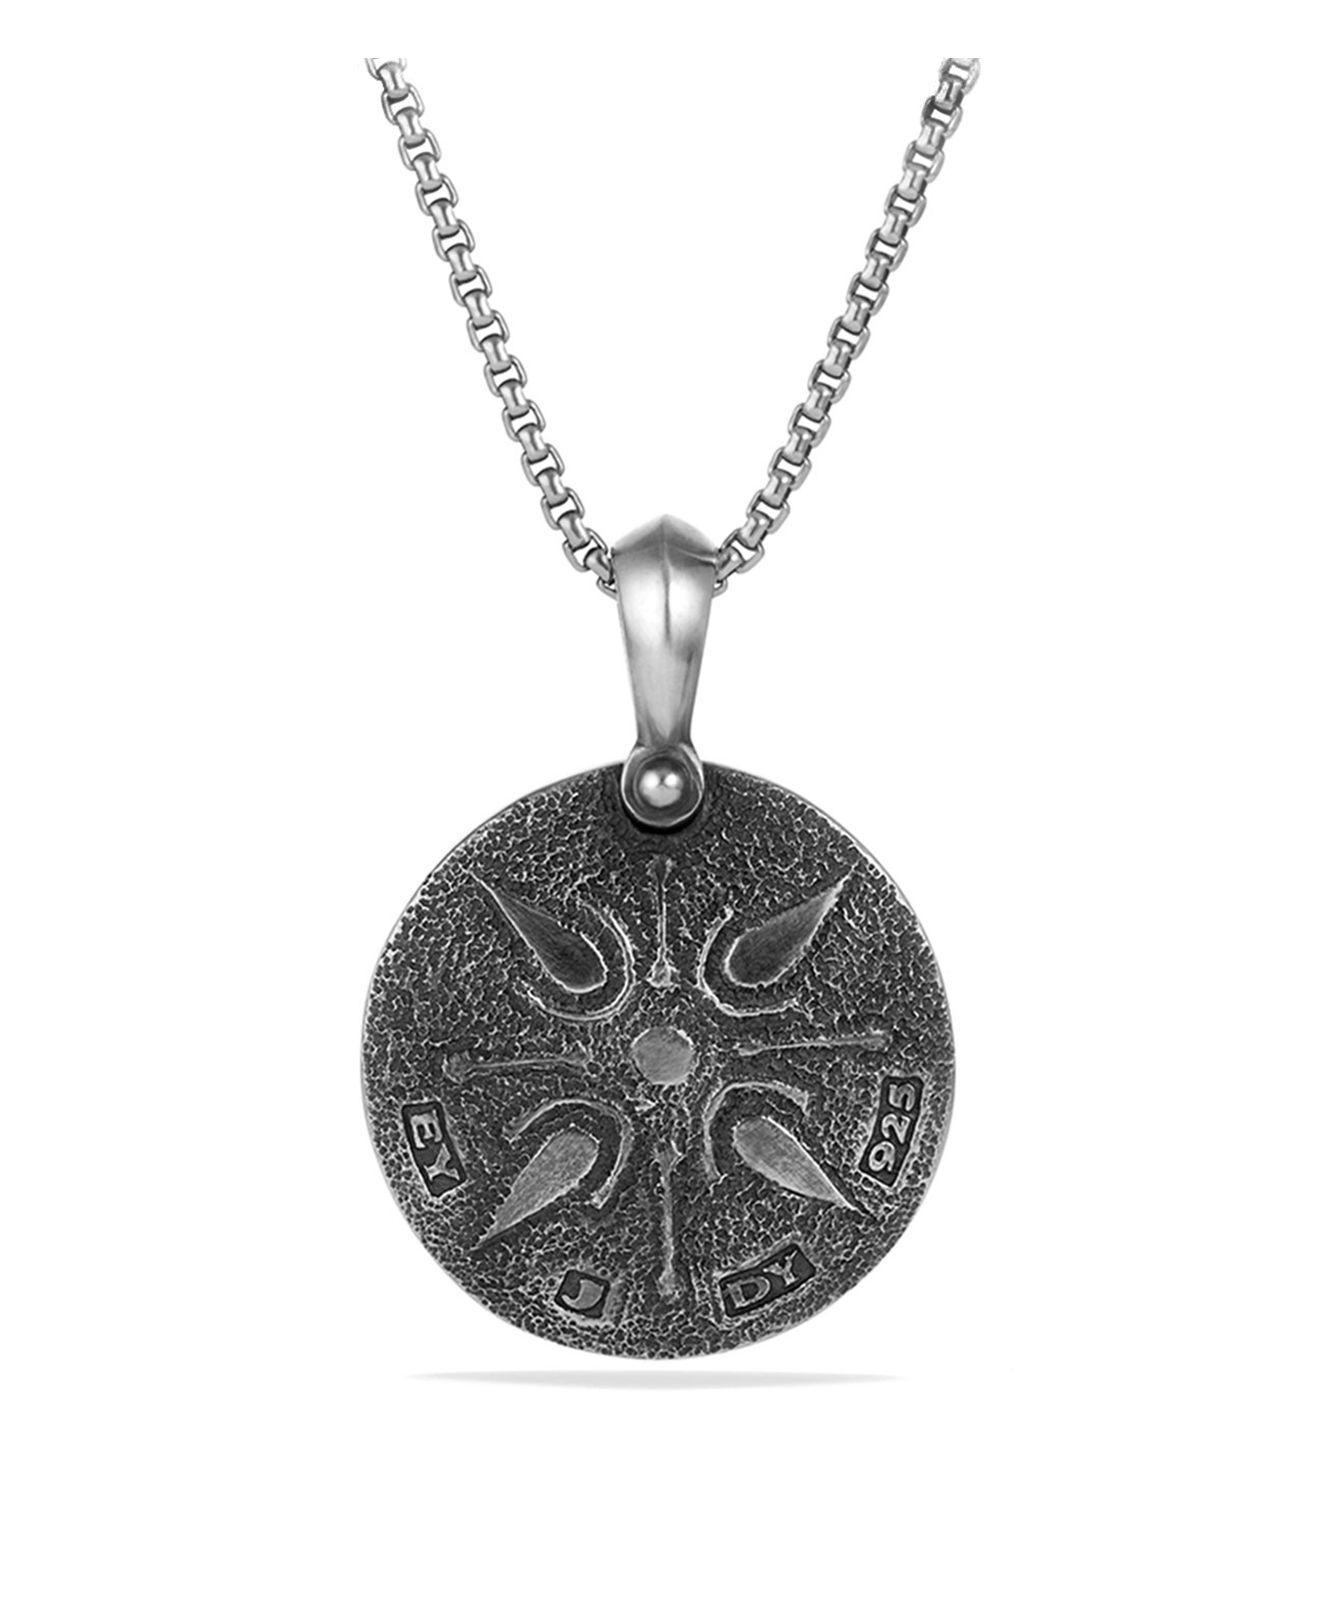 David Yurman Petrvs lion amulet - Metallic igcUi8ap